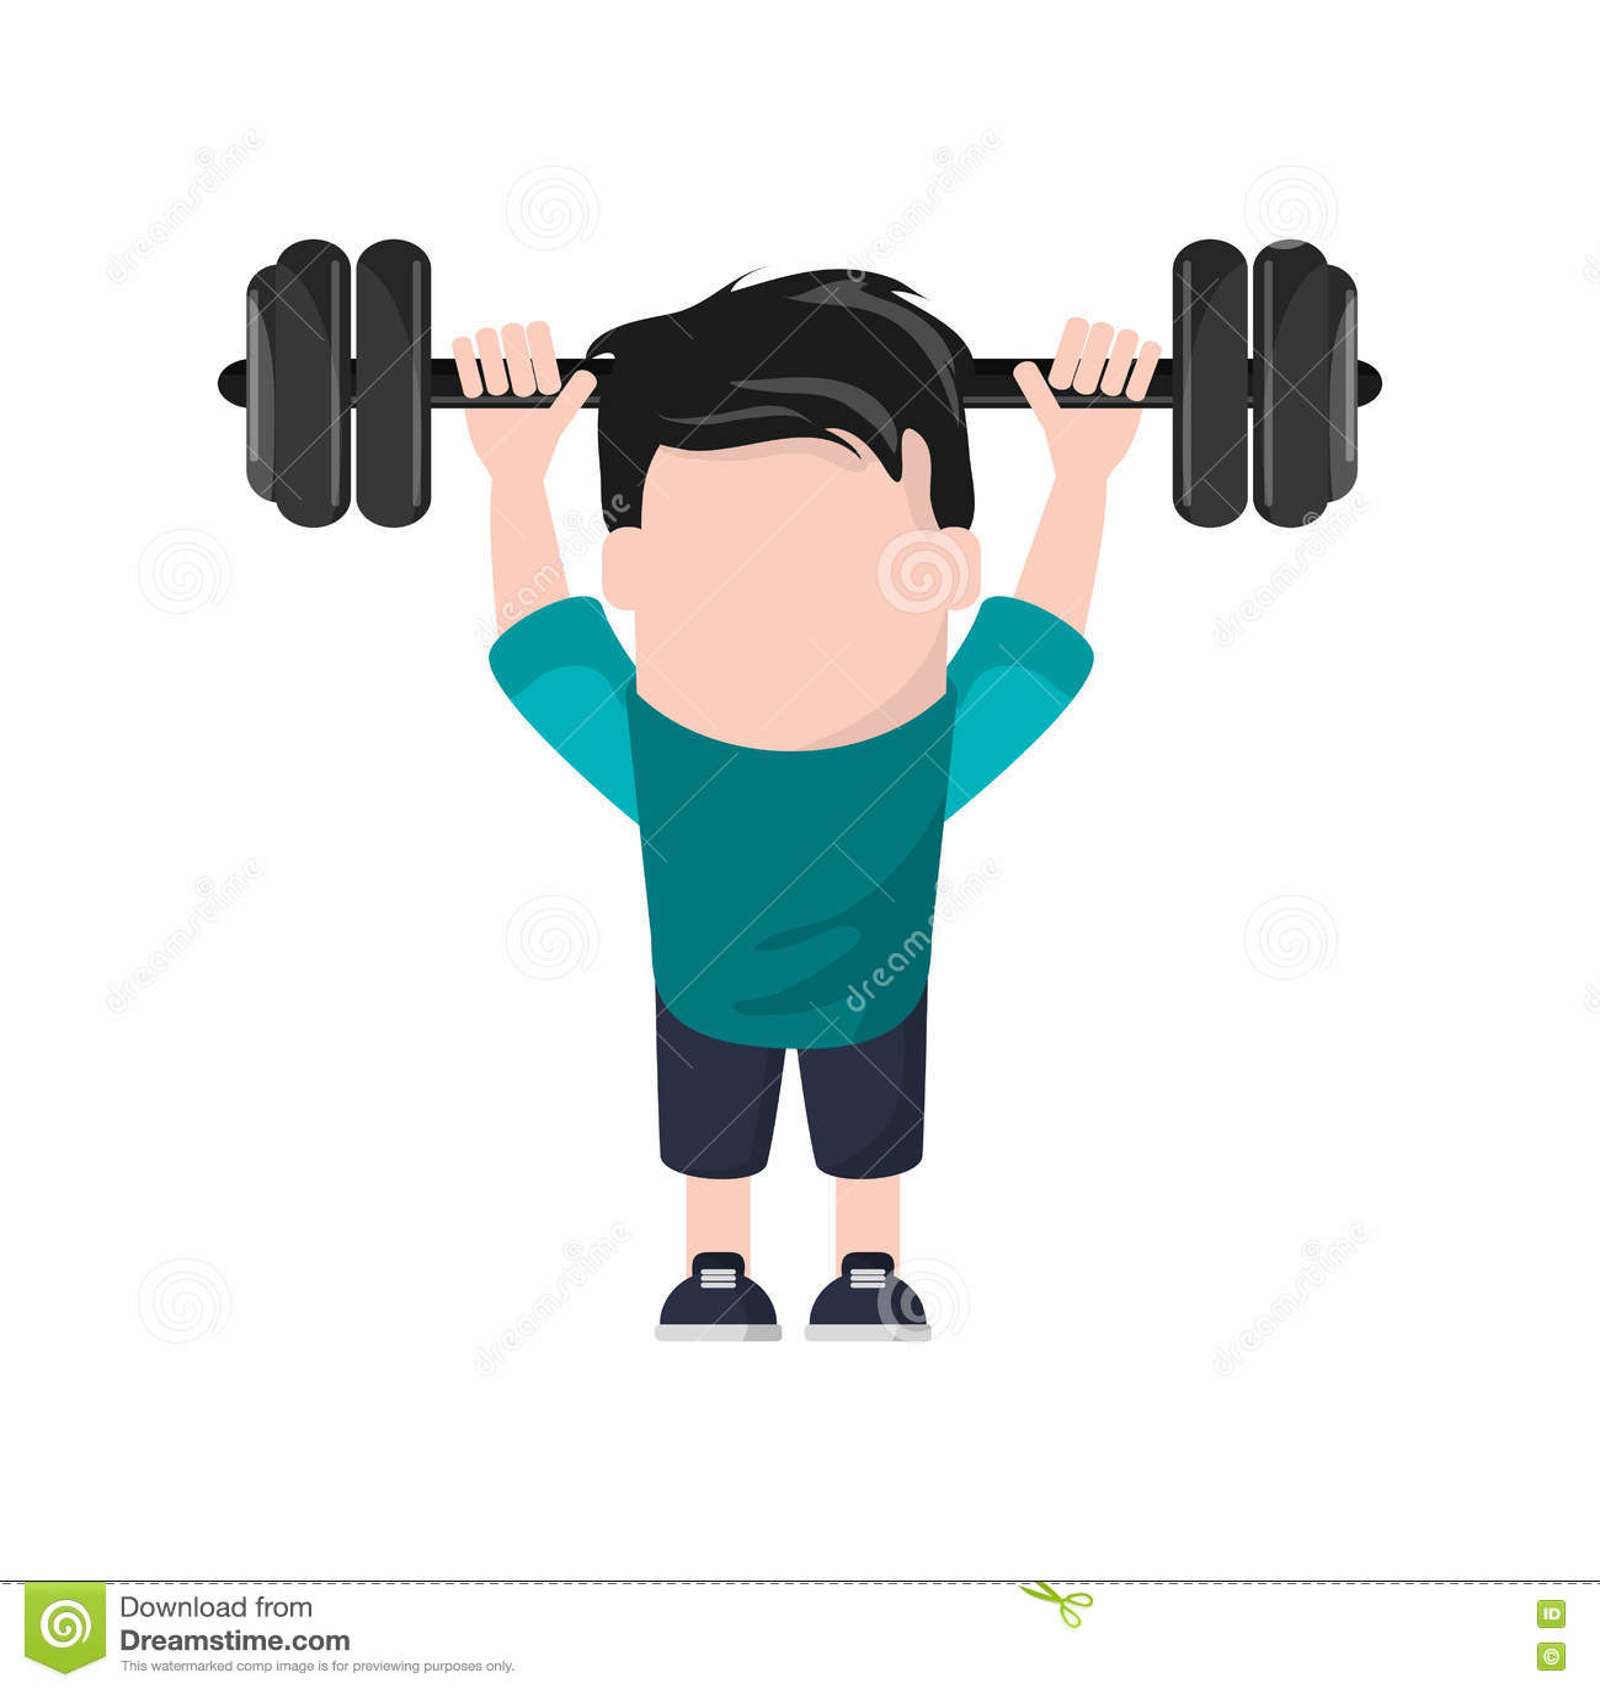 Gym Muscle Bodybuilding Black Mesh Fitness Power Lifting: Weight Lifting And Bodybuilding Vector Illustration